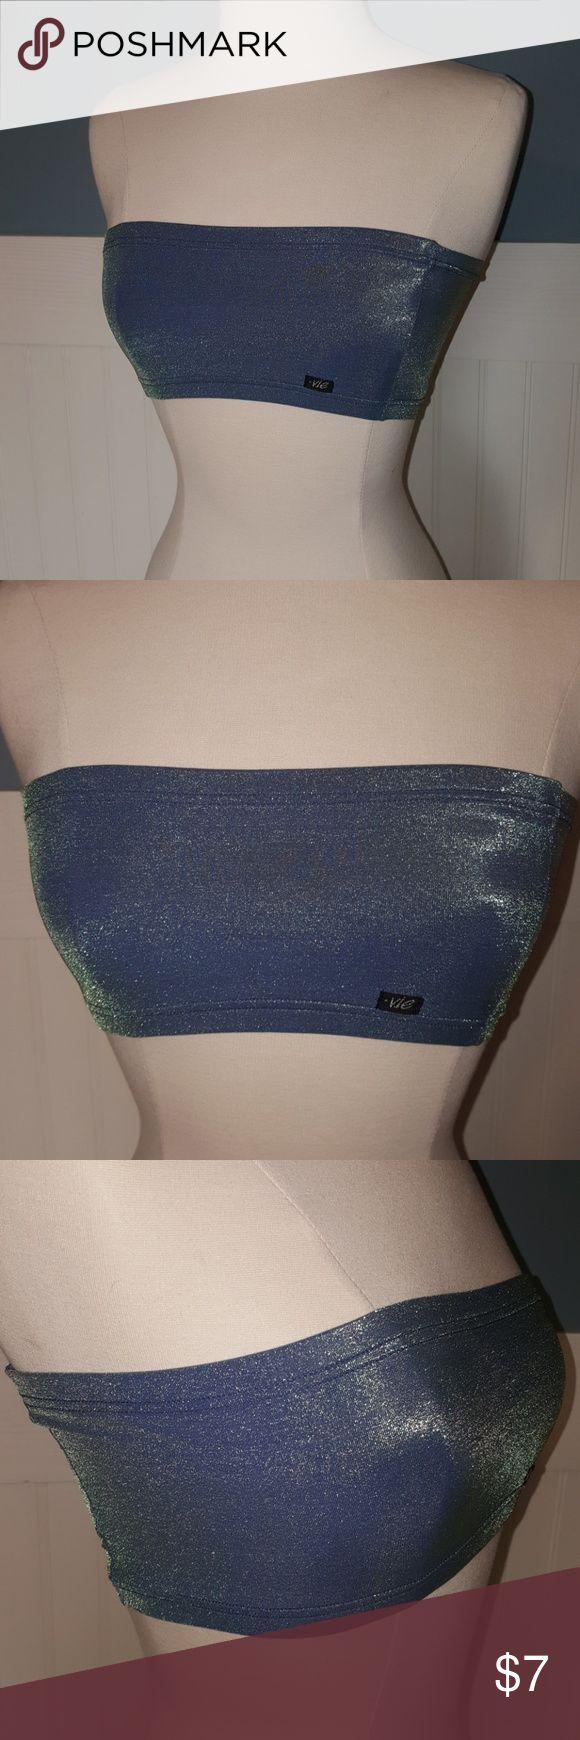 Vintage Shimmery Metallic Blue Green Bandeau Late 90's shimmery metallic blue green chameleon bandeau top or bra, worn once.  Bust: 33 Vie Intimates & Sleepwear Bandeaus